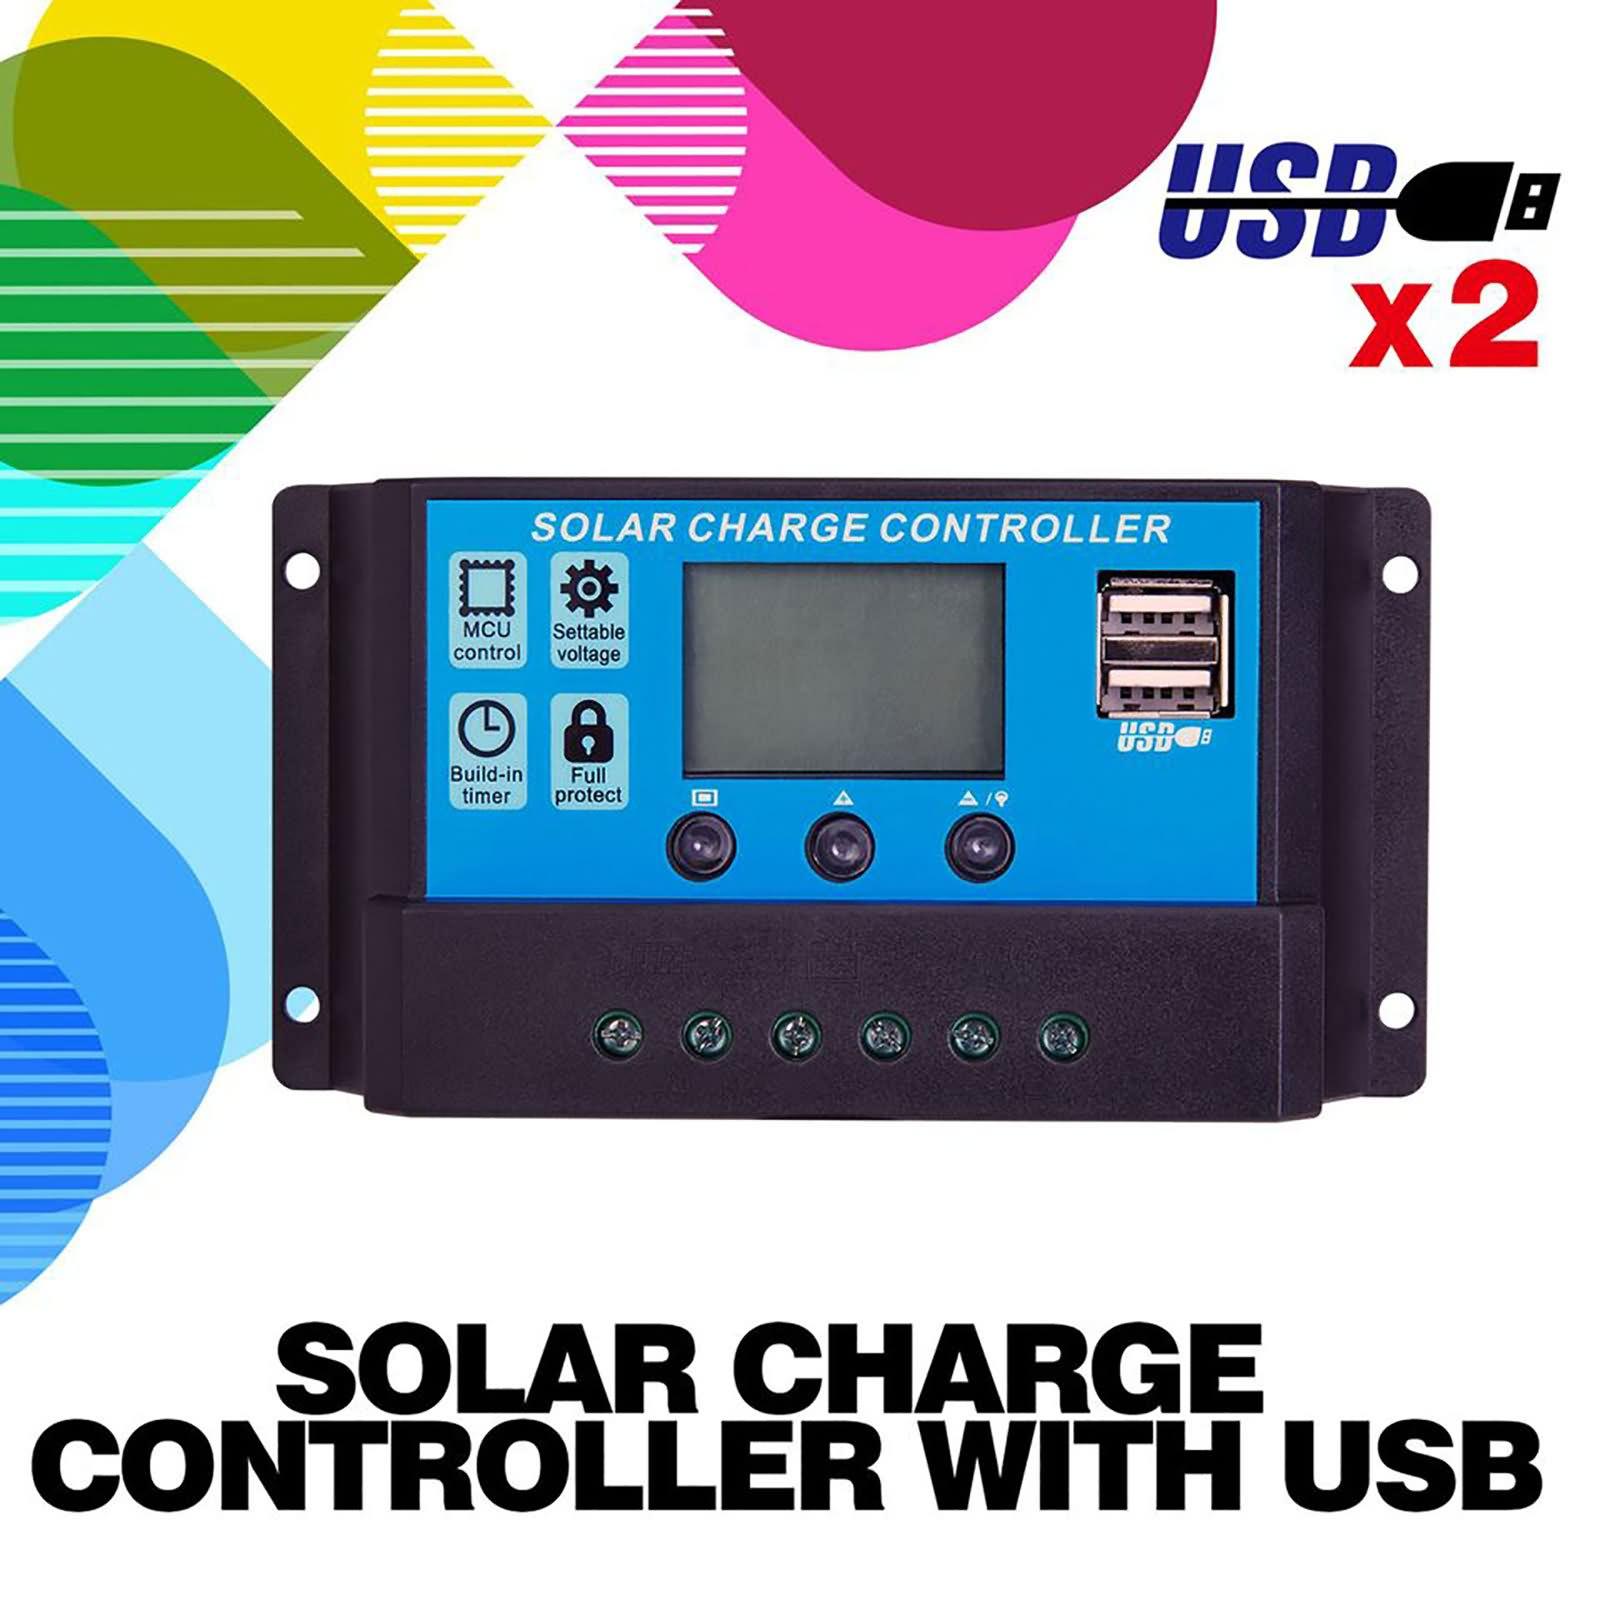 160W-Folding-Solar-Panel-Kit-12v-Mono-Caravan-Camping-Power-Charging-Battery-USB